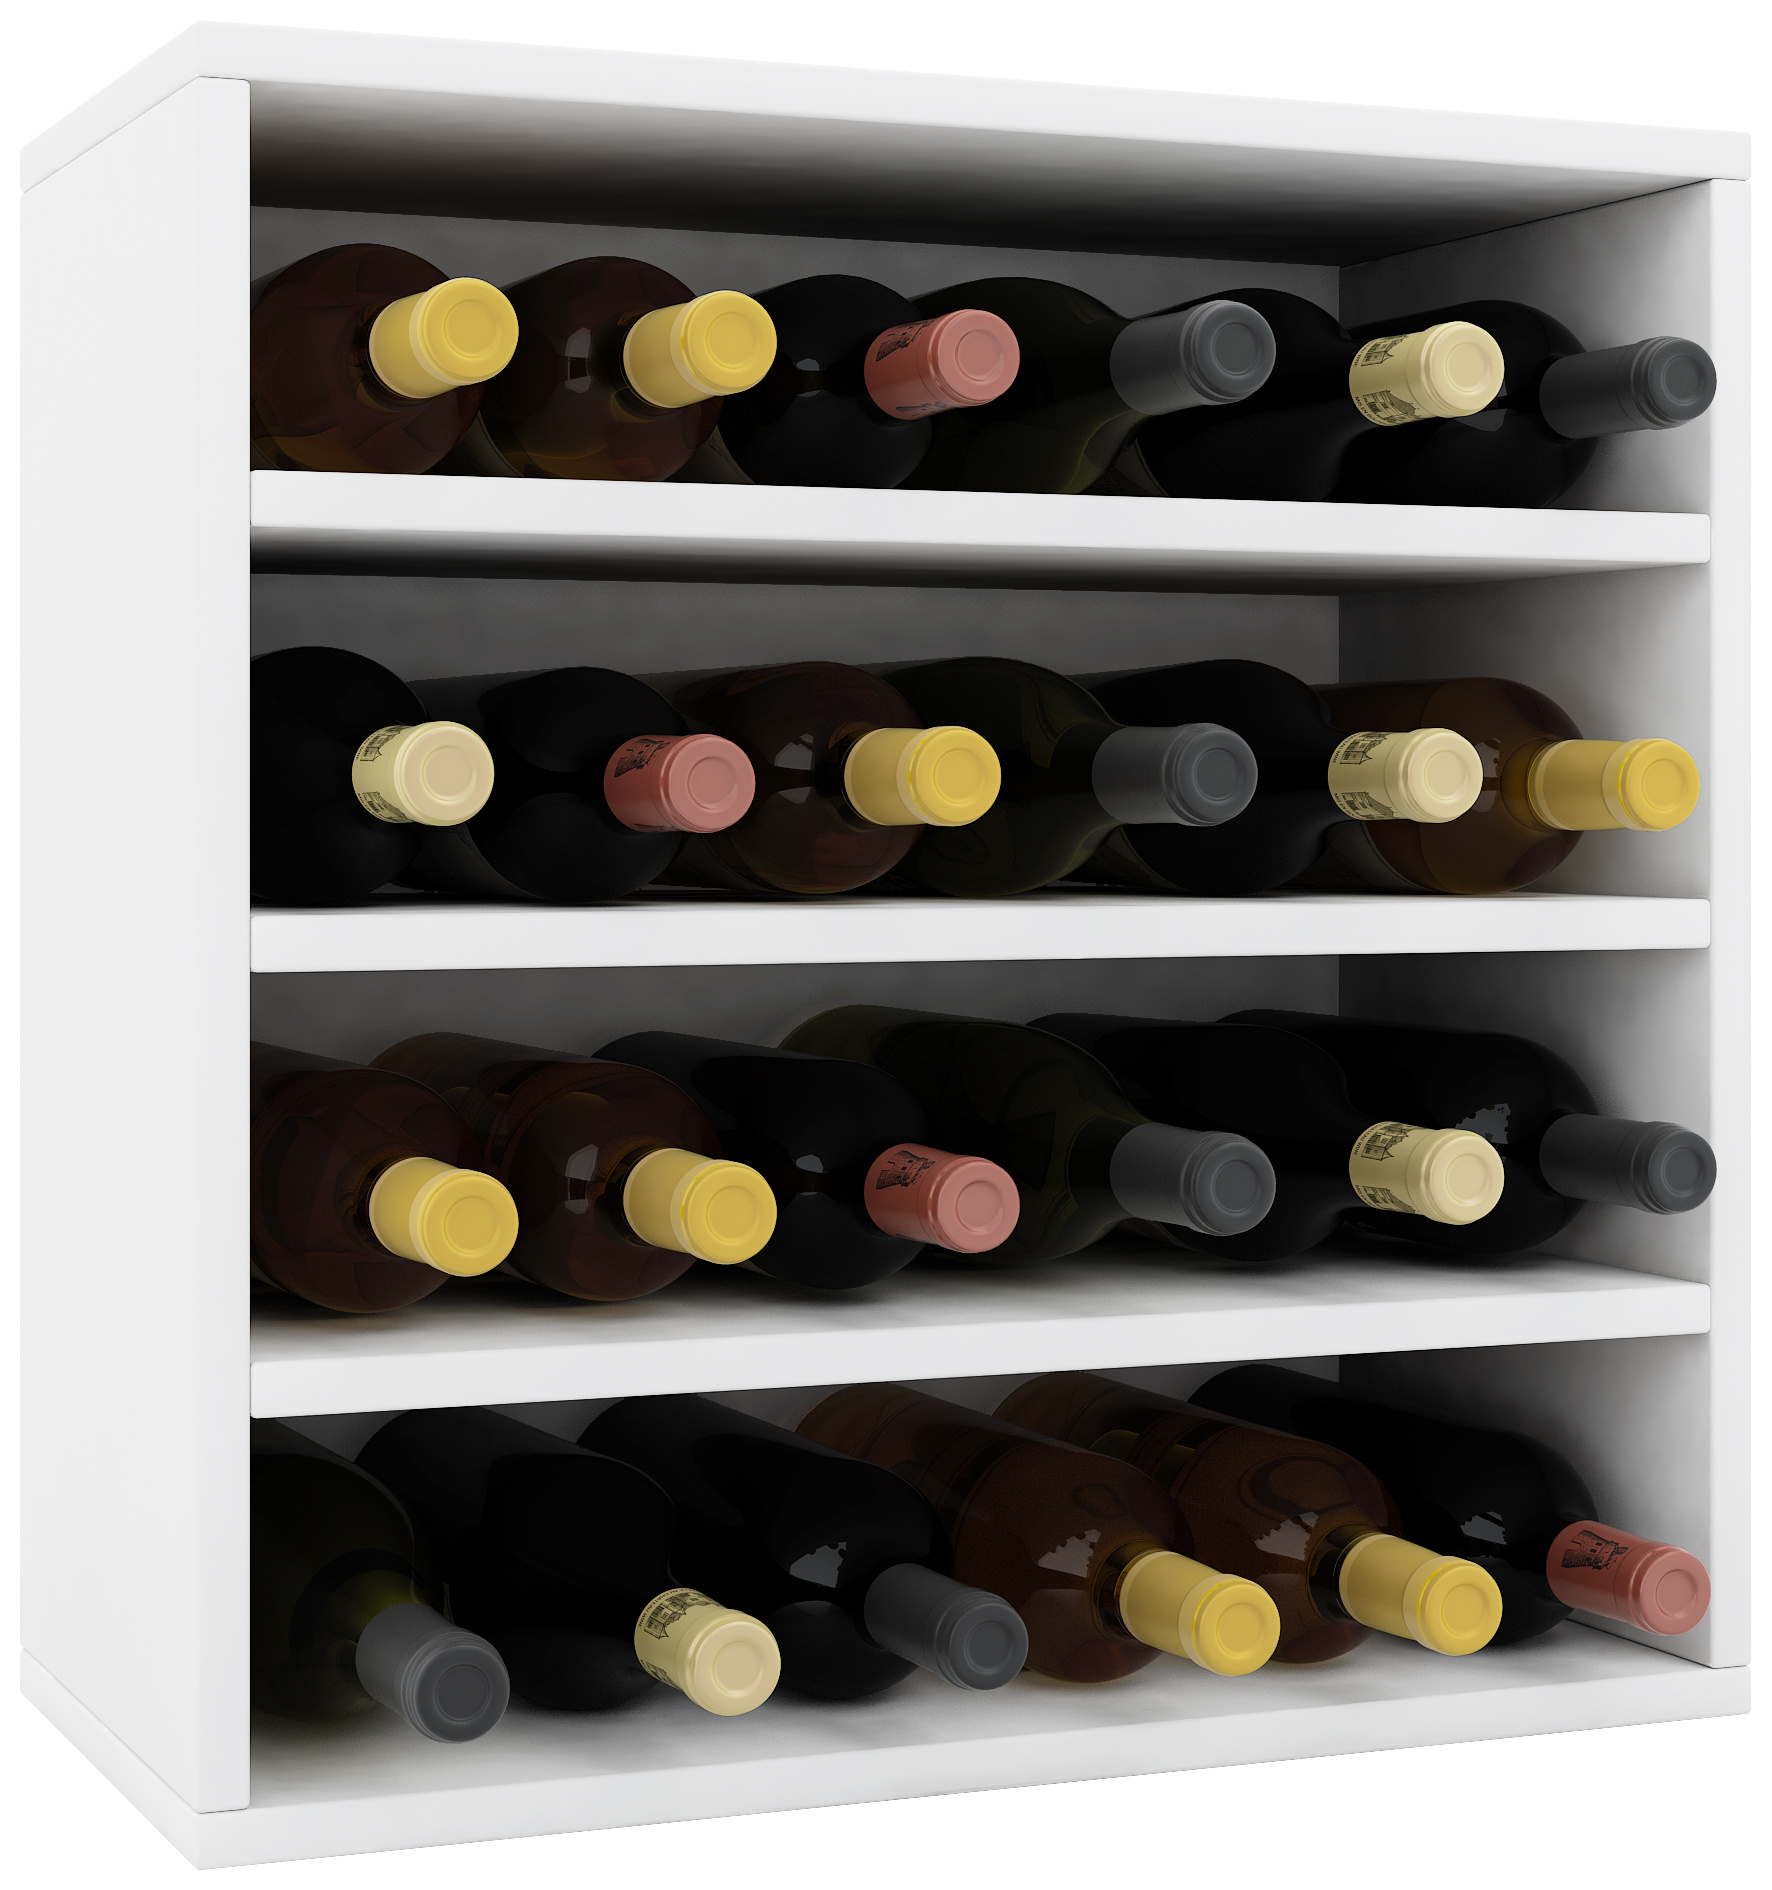 Vcm Wein Regalserie Regal Weinregal Weinschrank Weinflaschen Schrank Holz Wurfel Flaschen Aufbewahrung Weino Vcm Weinregal Serie Weino Farbe Weino Lv Weiss Weltbild De